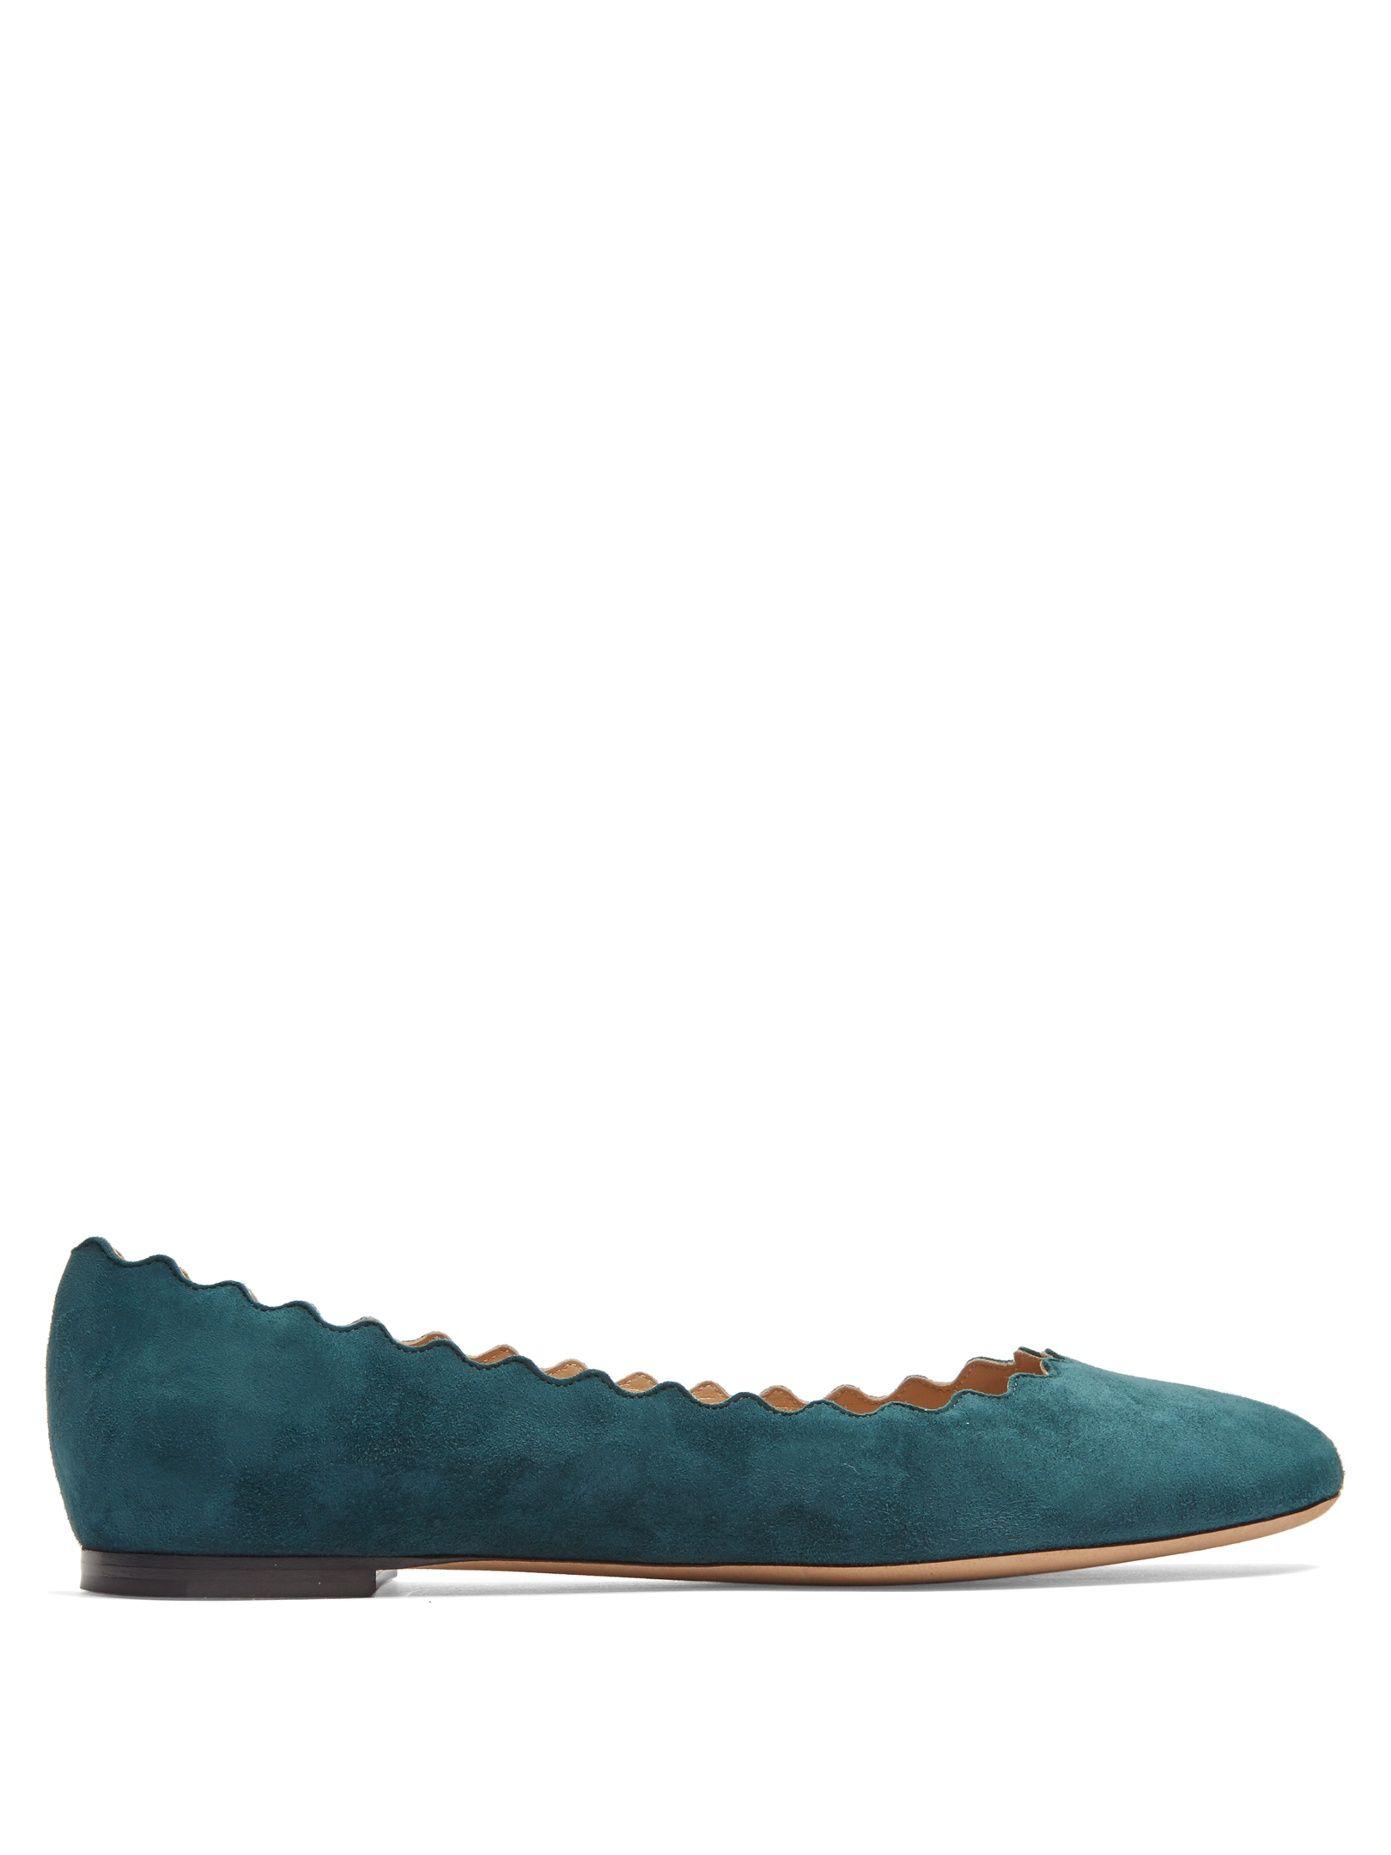 Chloé | Womenswear | Shop Online at MATCHESFASHION.COM UK. Green SuedeTeal  GreenSuede FlatsScalloped ...